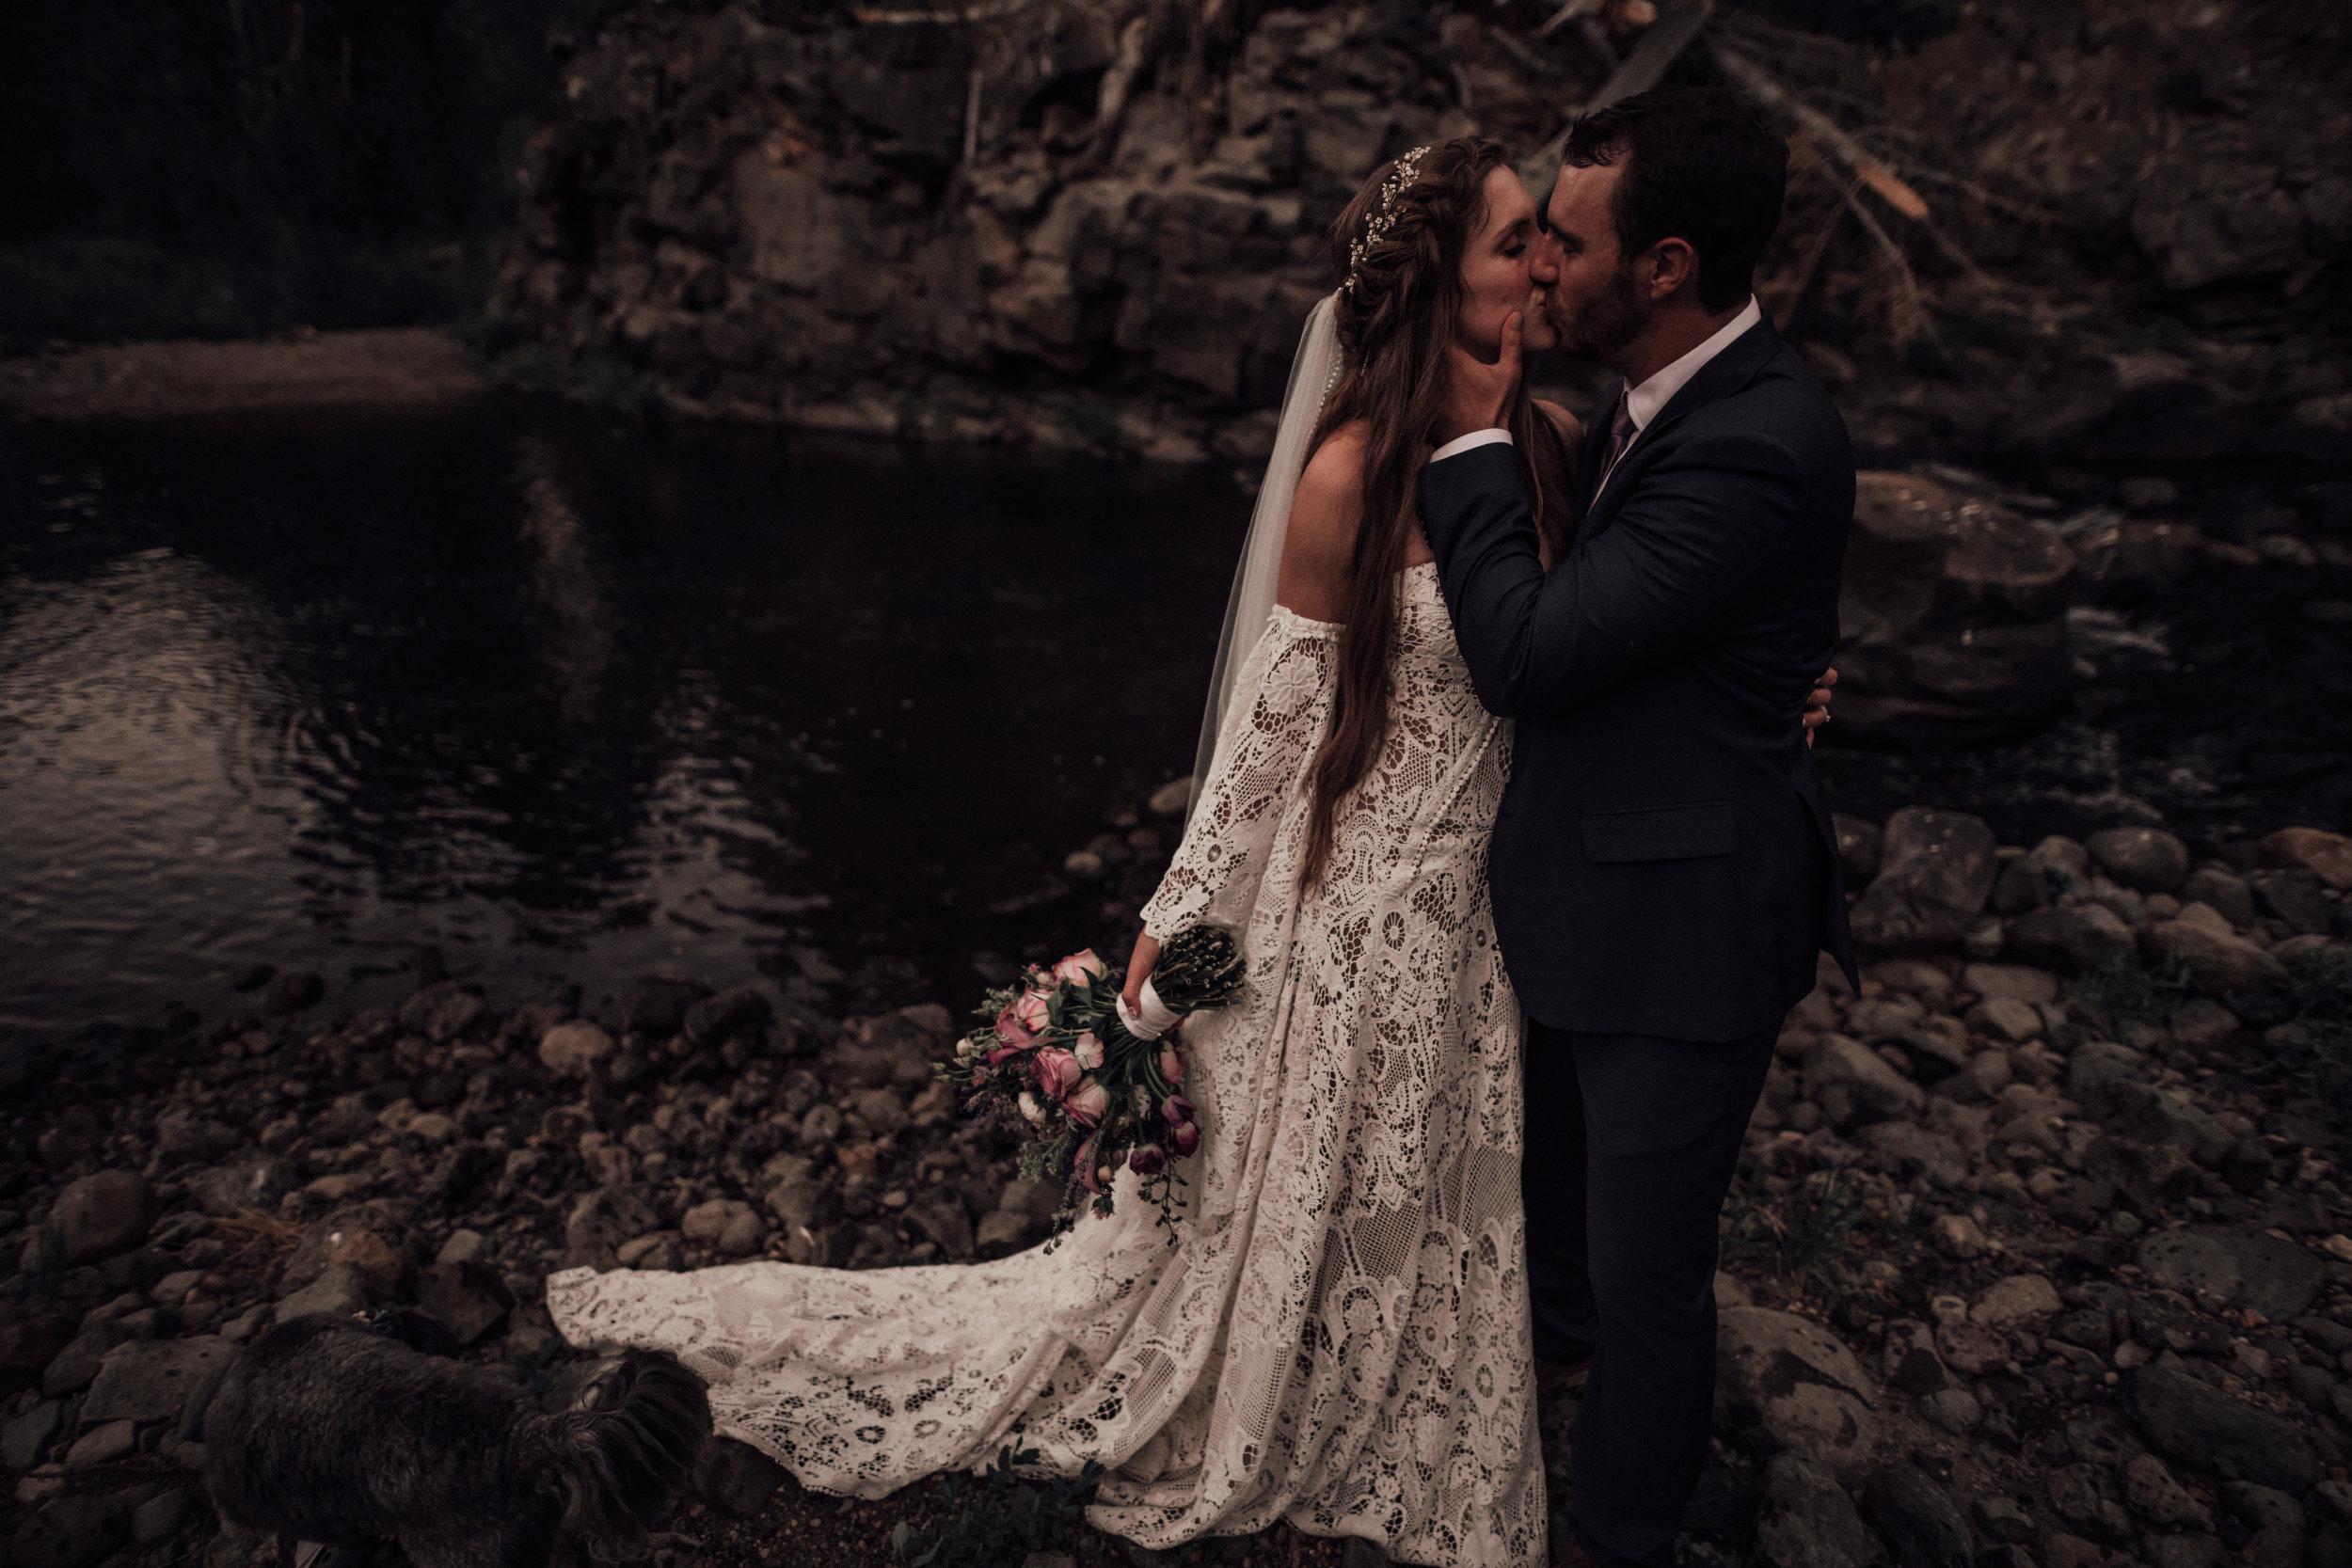 may-wedding-dancing-pines-sierraville-wedding-ca-danielle-kyle-junebug-photography-lake-tahoe-1-2584.jpg